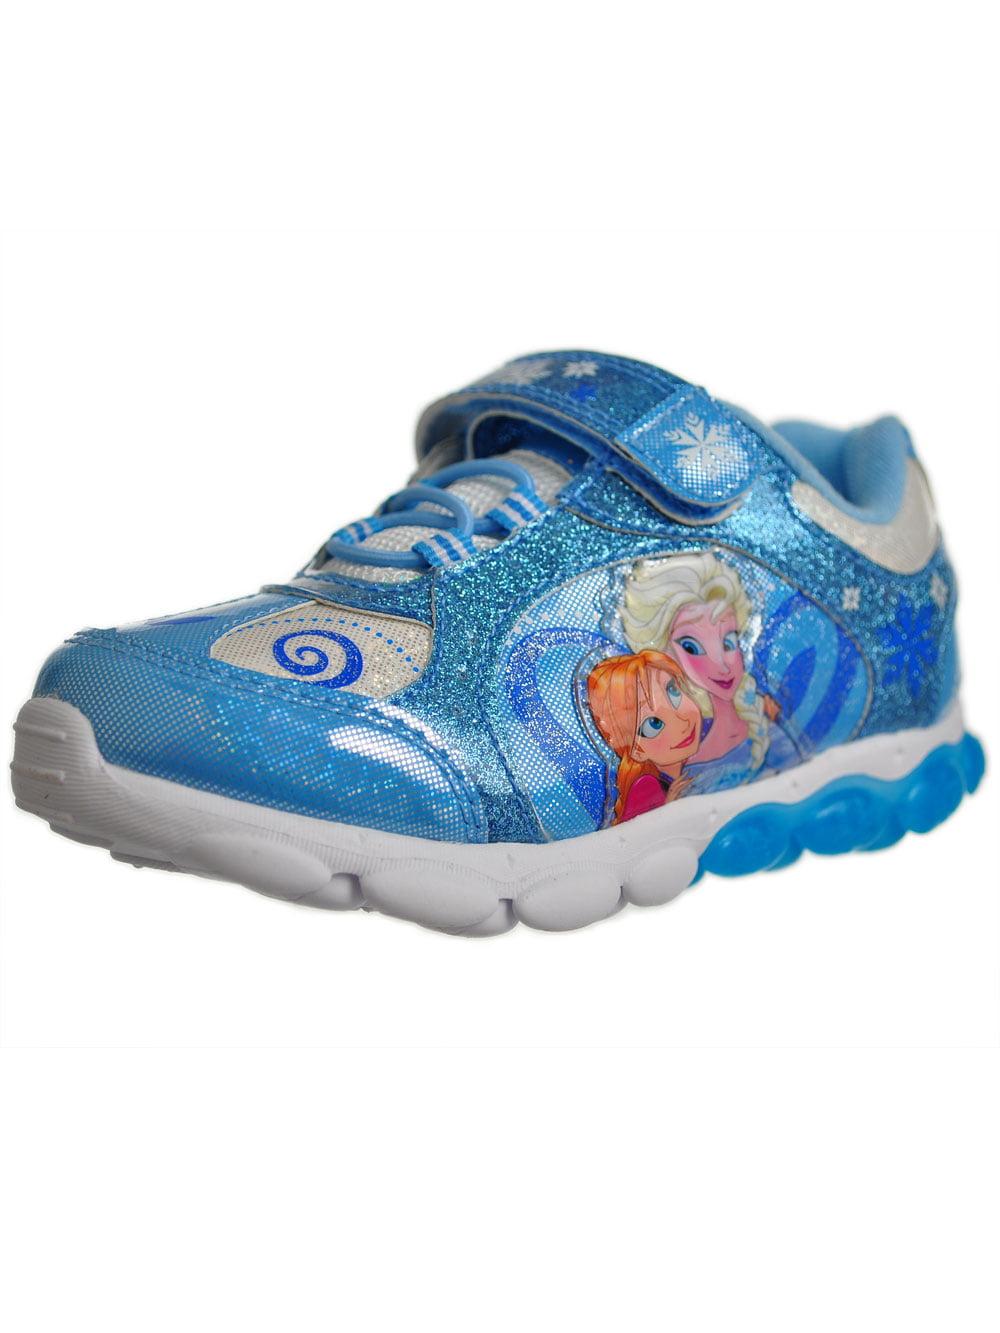 Frozen Anna \u0026 Elsa Light Up Shoes for